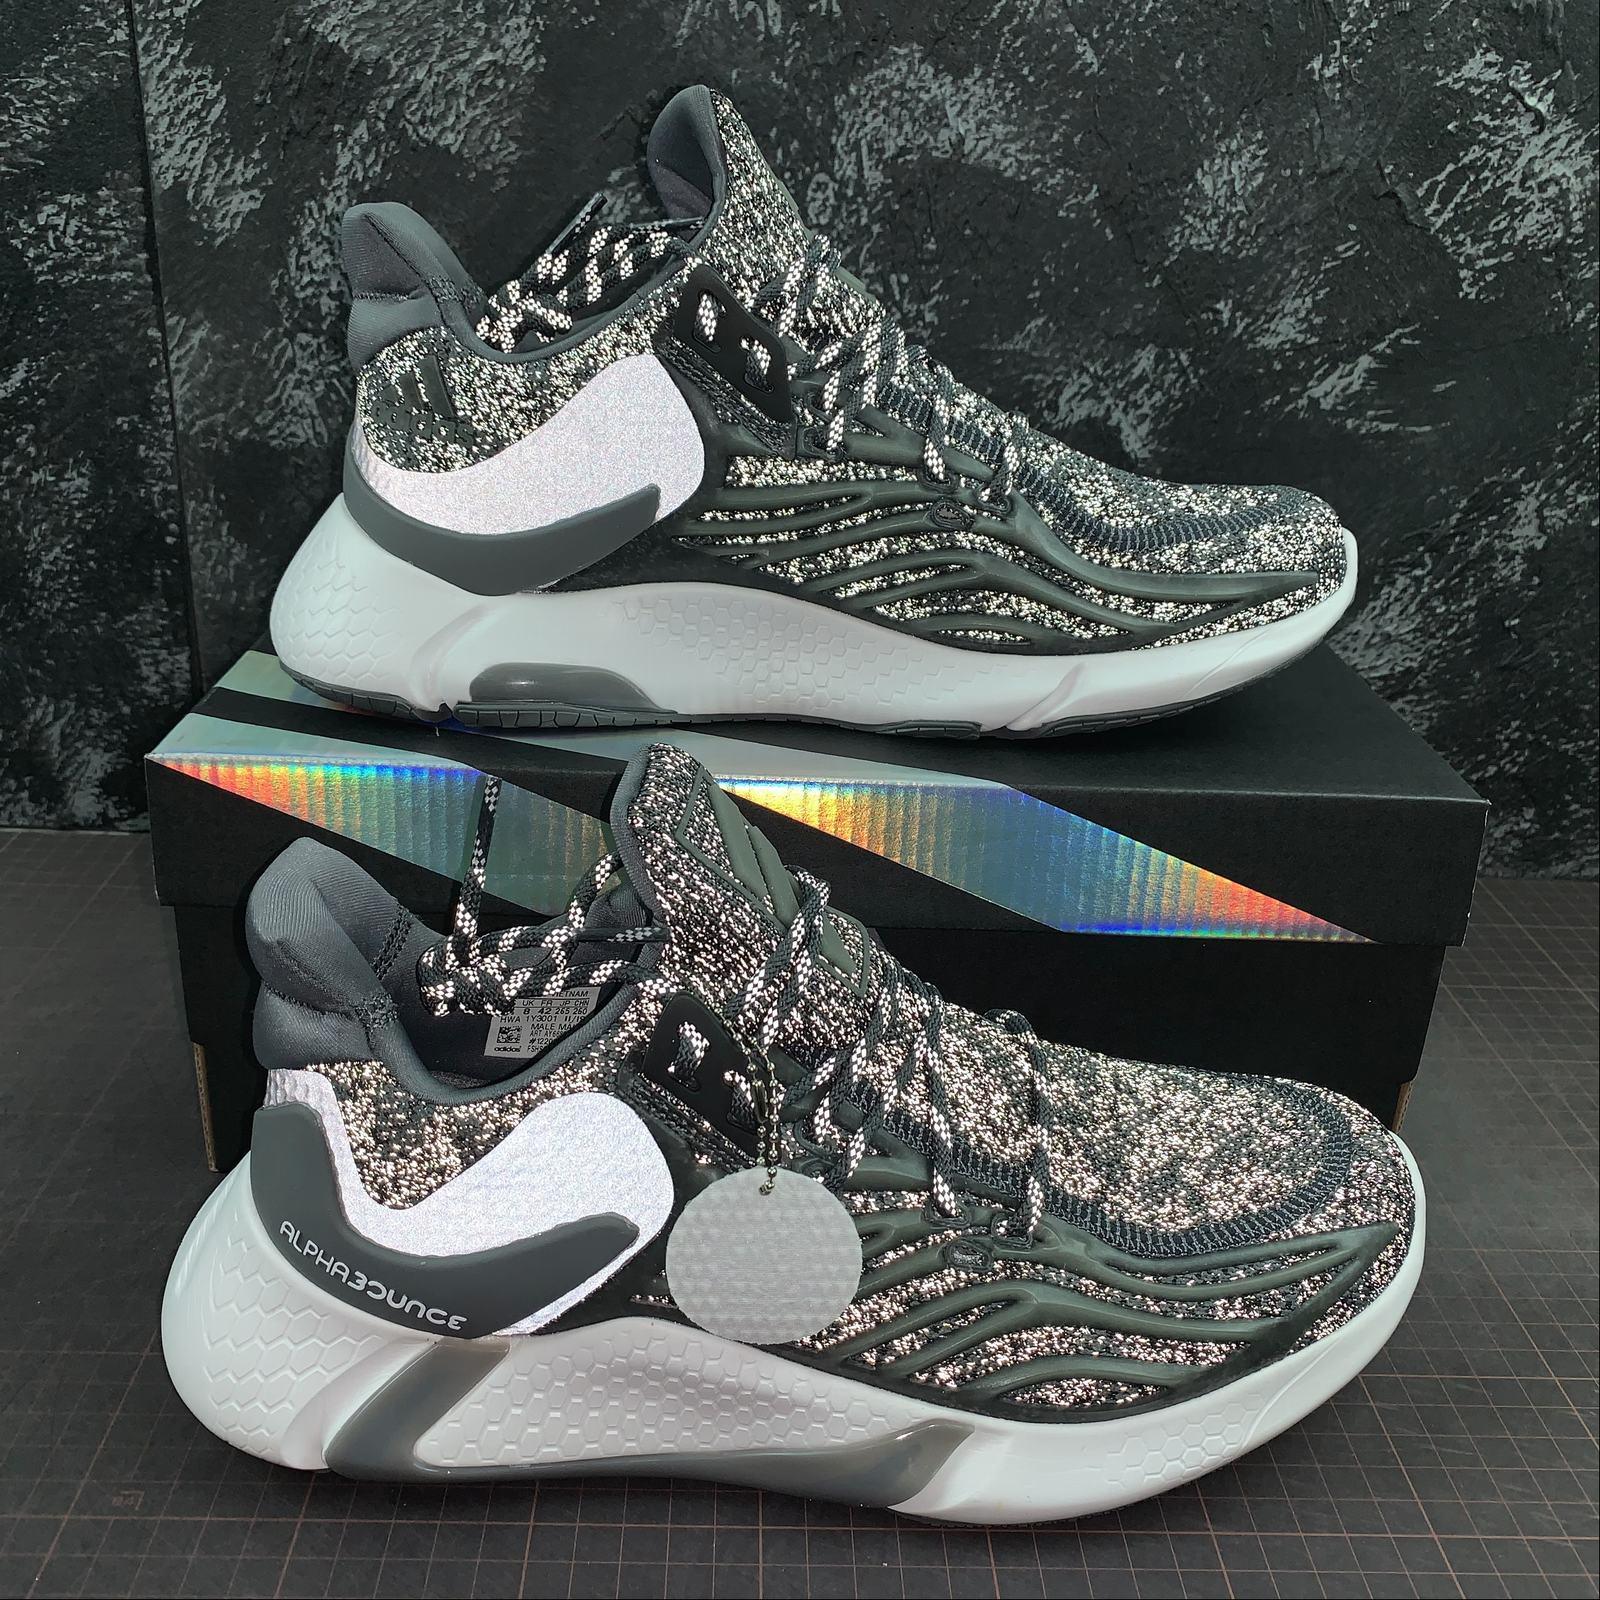 giay-sneaker-adidas-alphabounce-yeezy-boost-ay6688-doi-mau